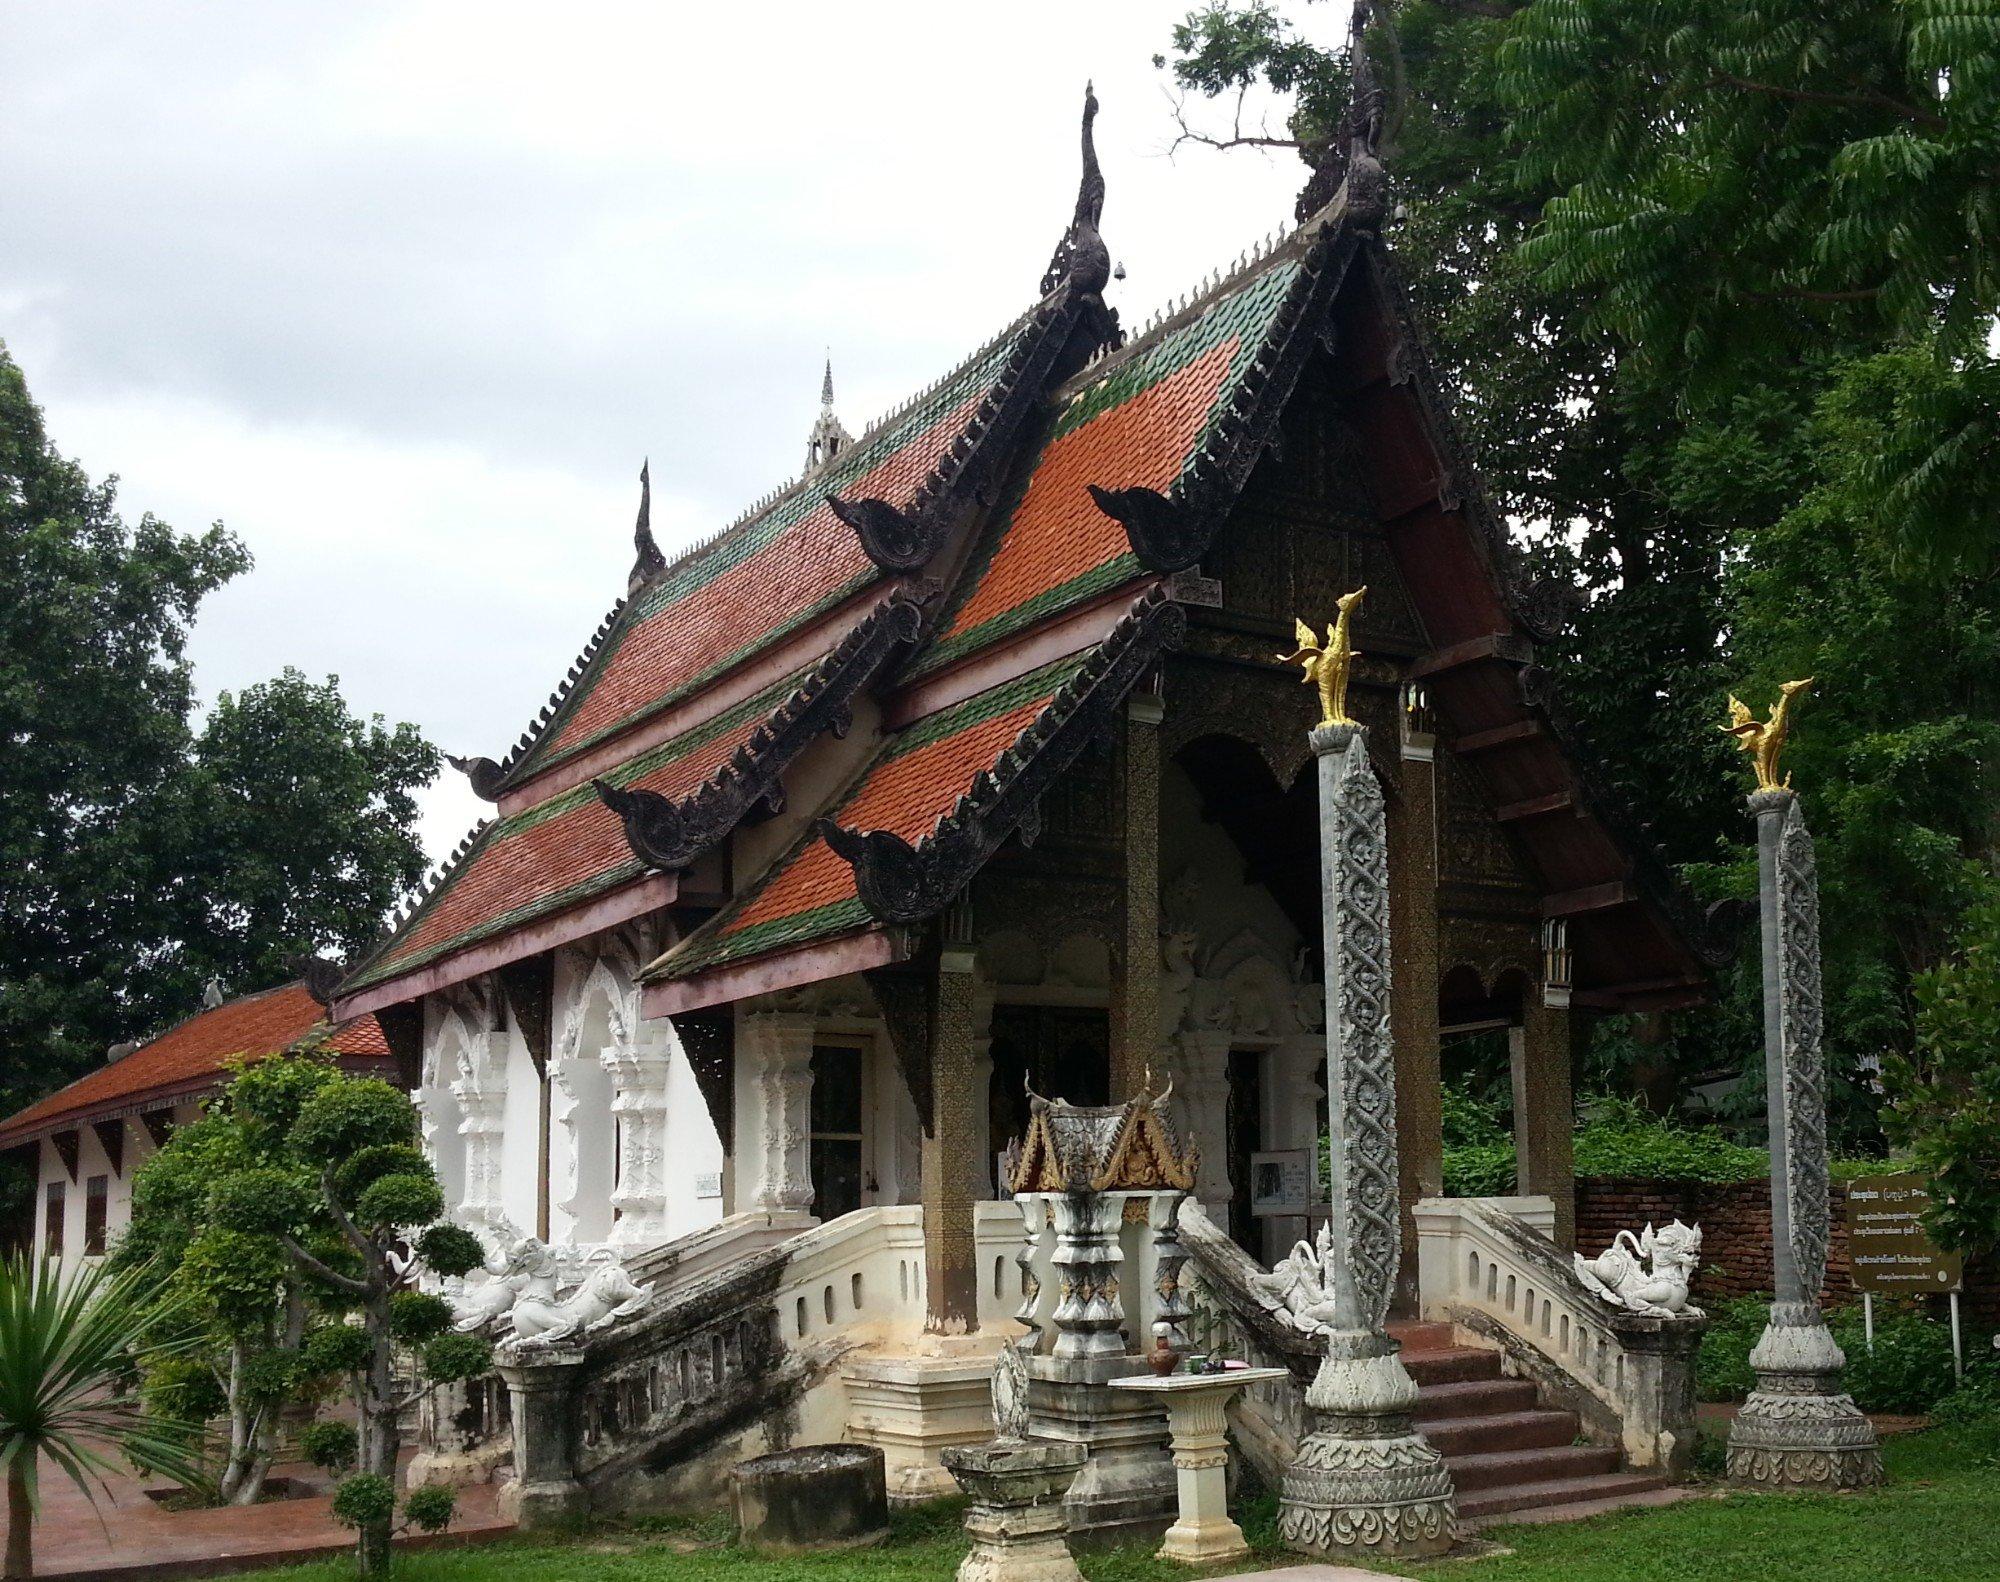 Ordination hall at Wat Pratu Pong